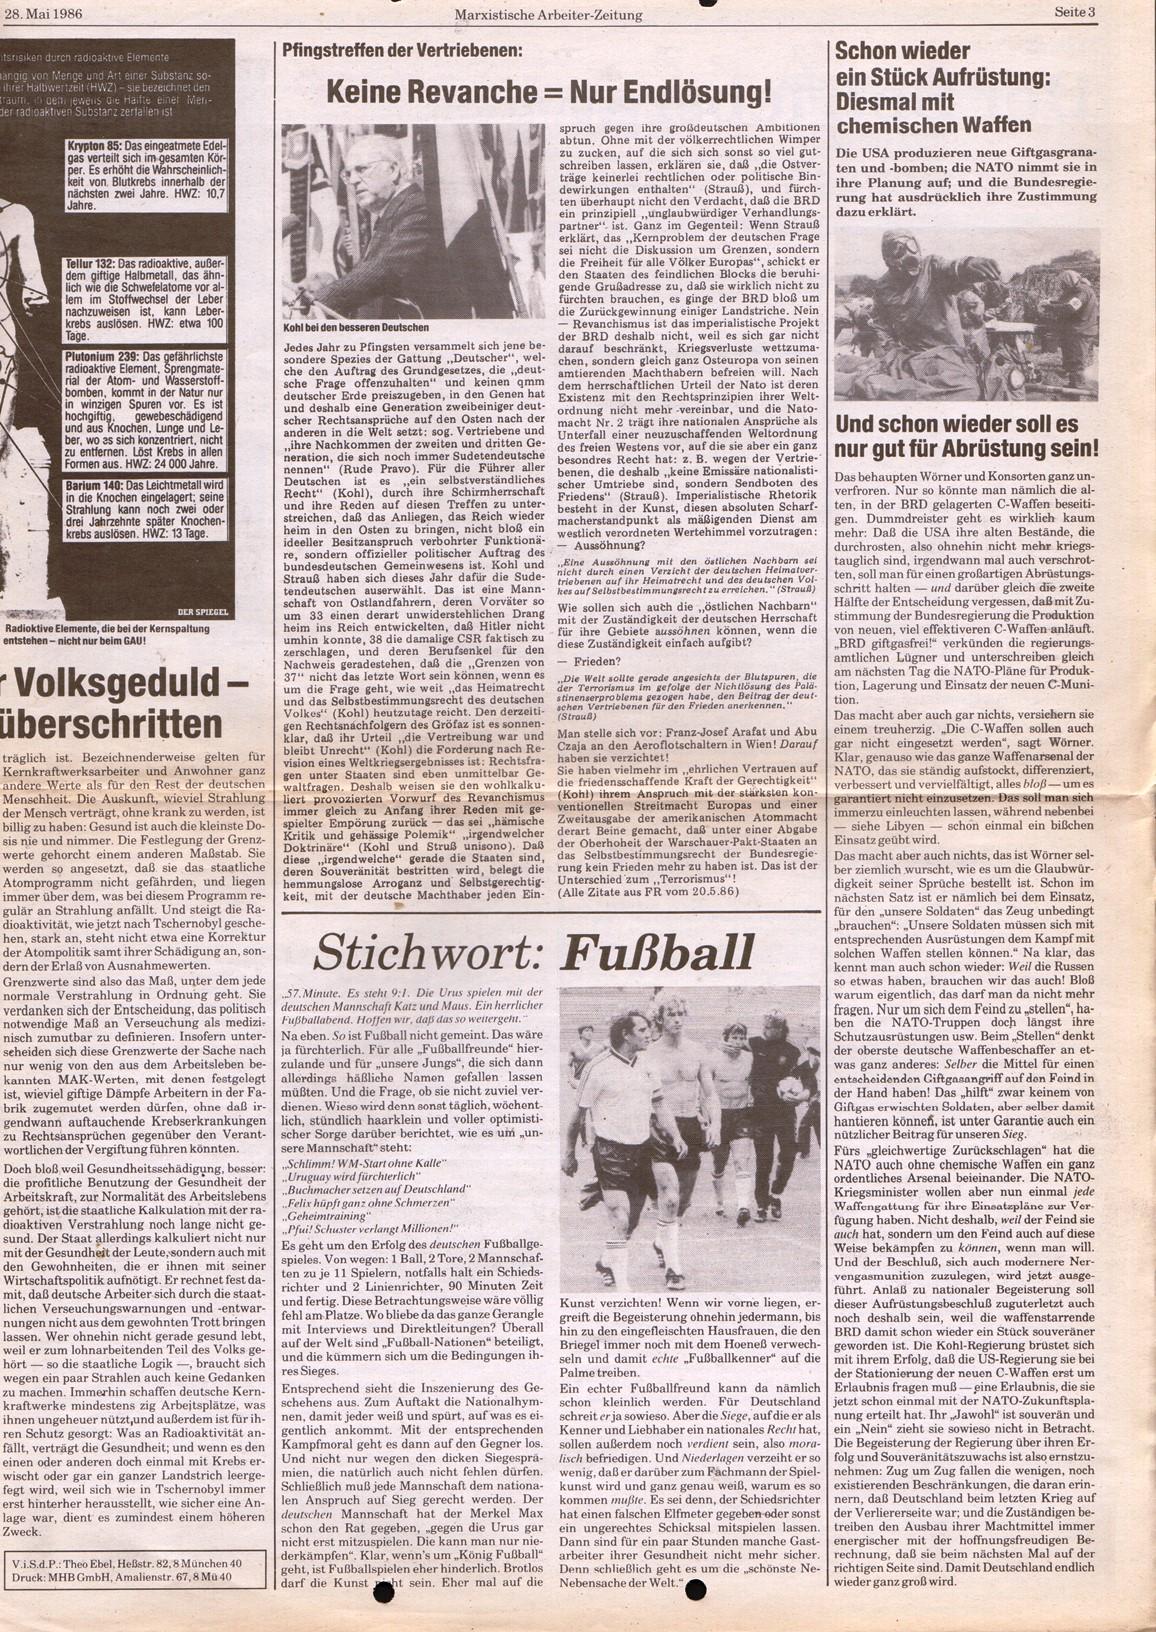 Muenchen_MG_MAZ_Lehrlinge_19860602_03